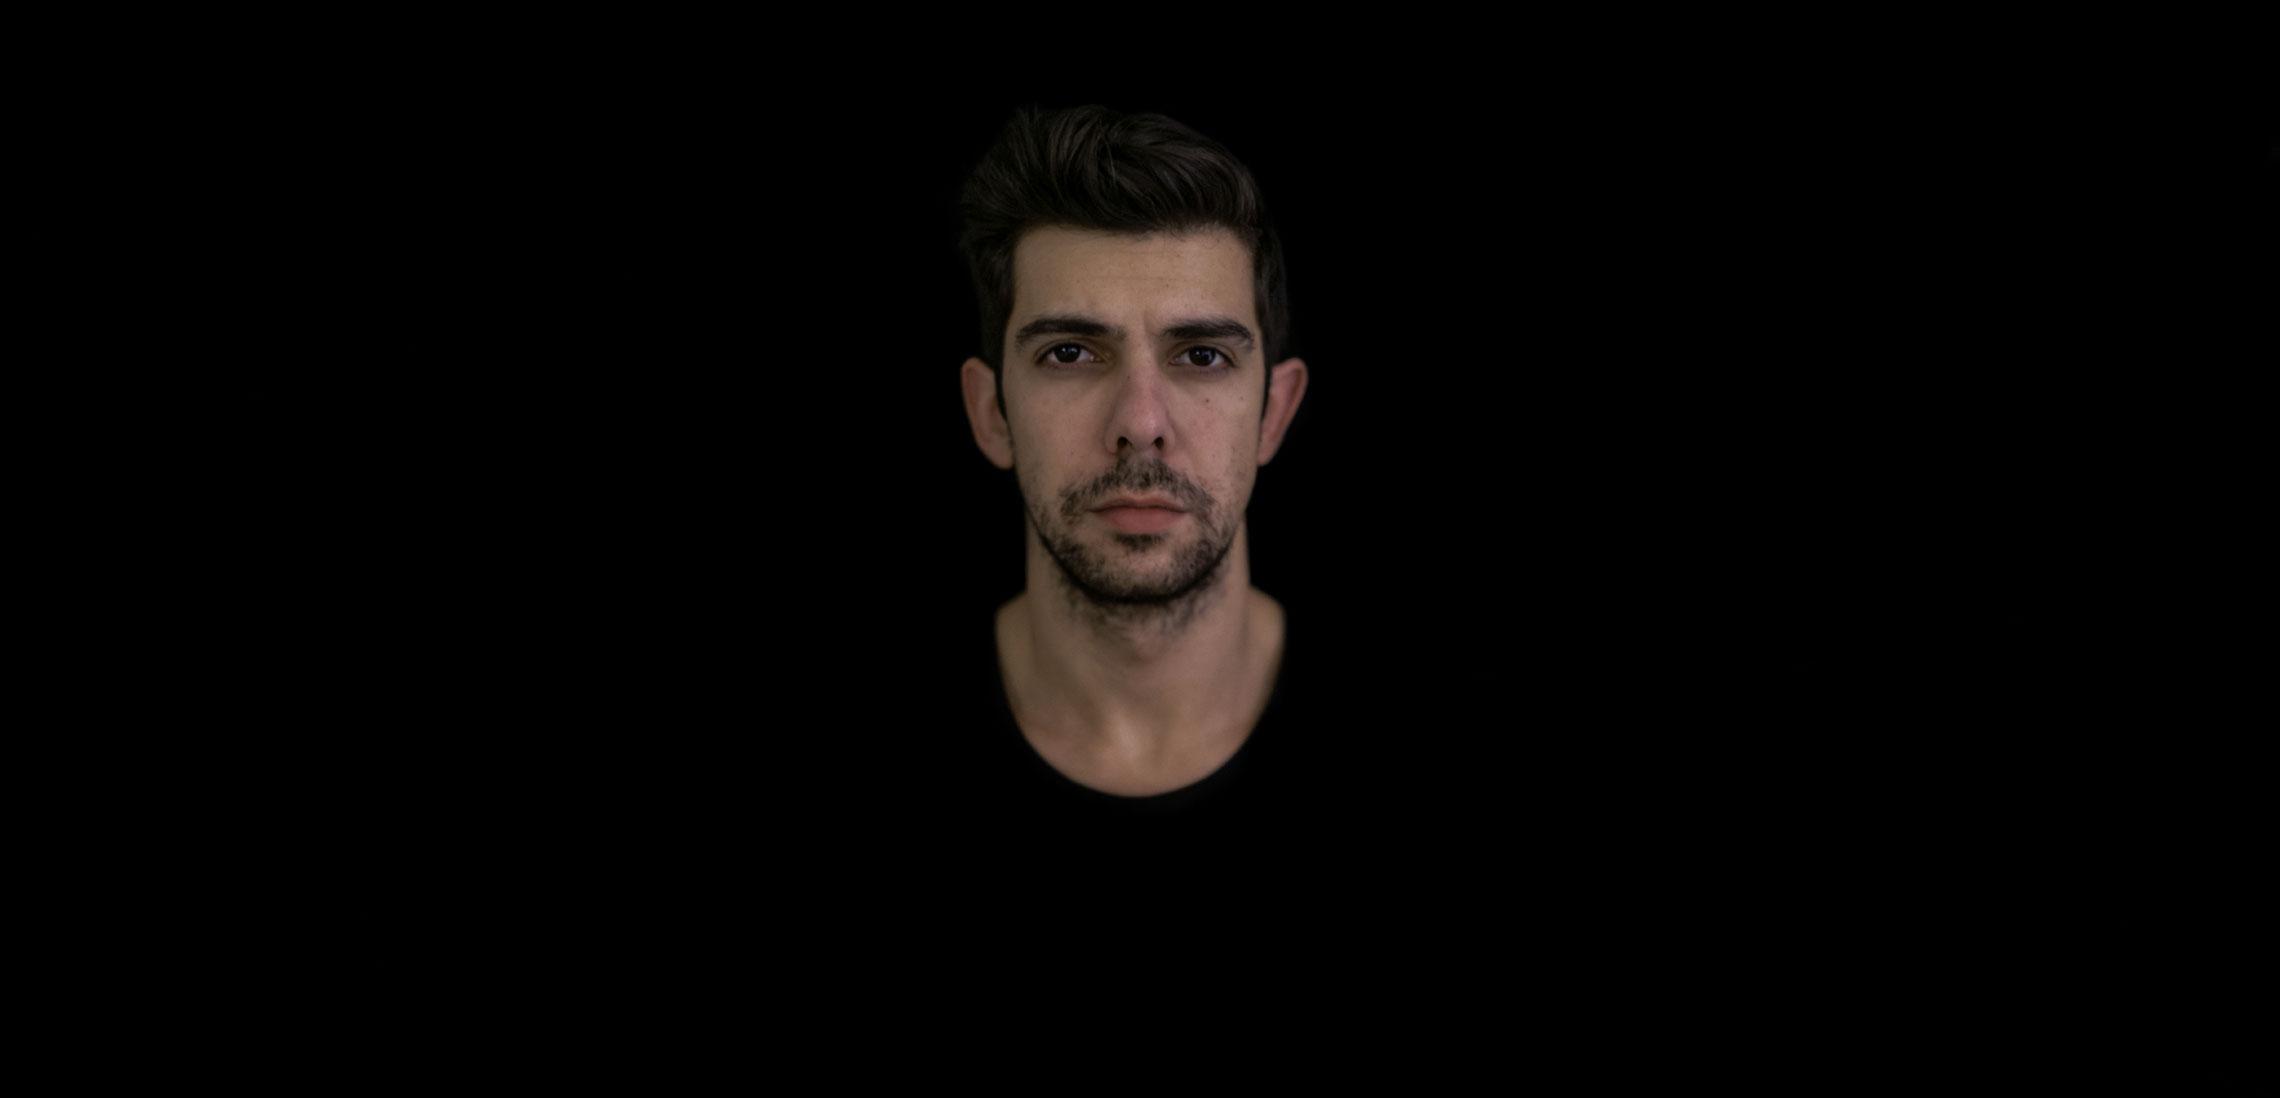 Alex Dimou - Tot hero